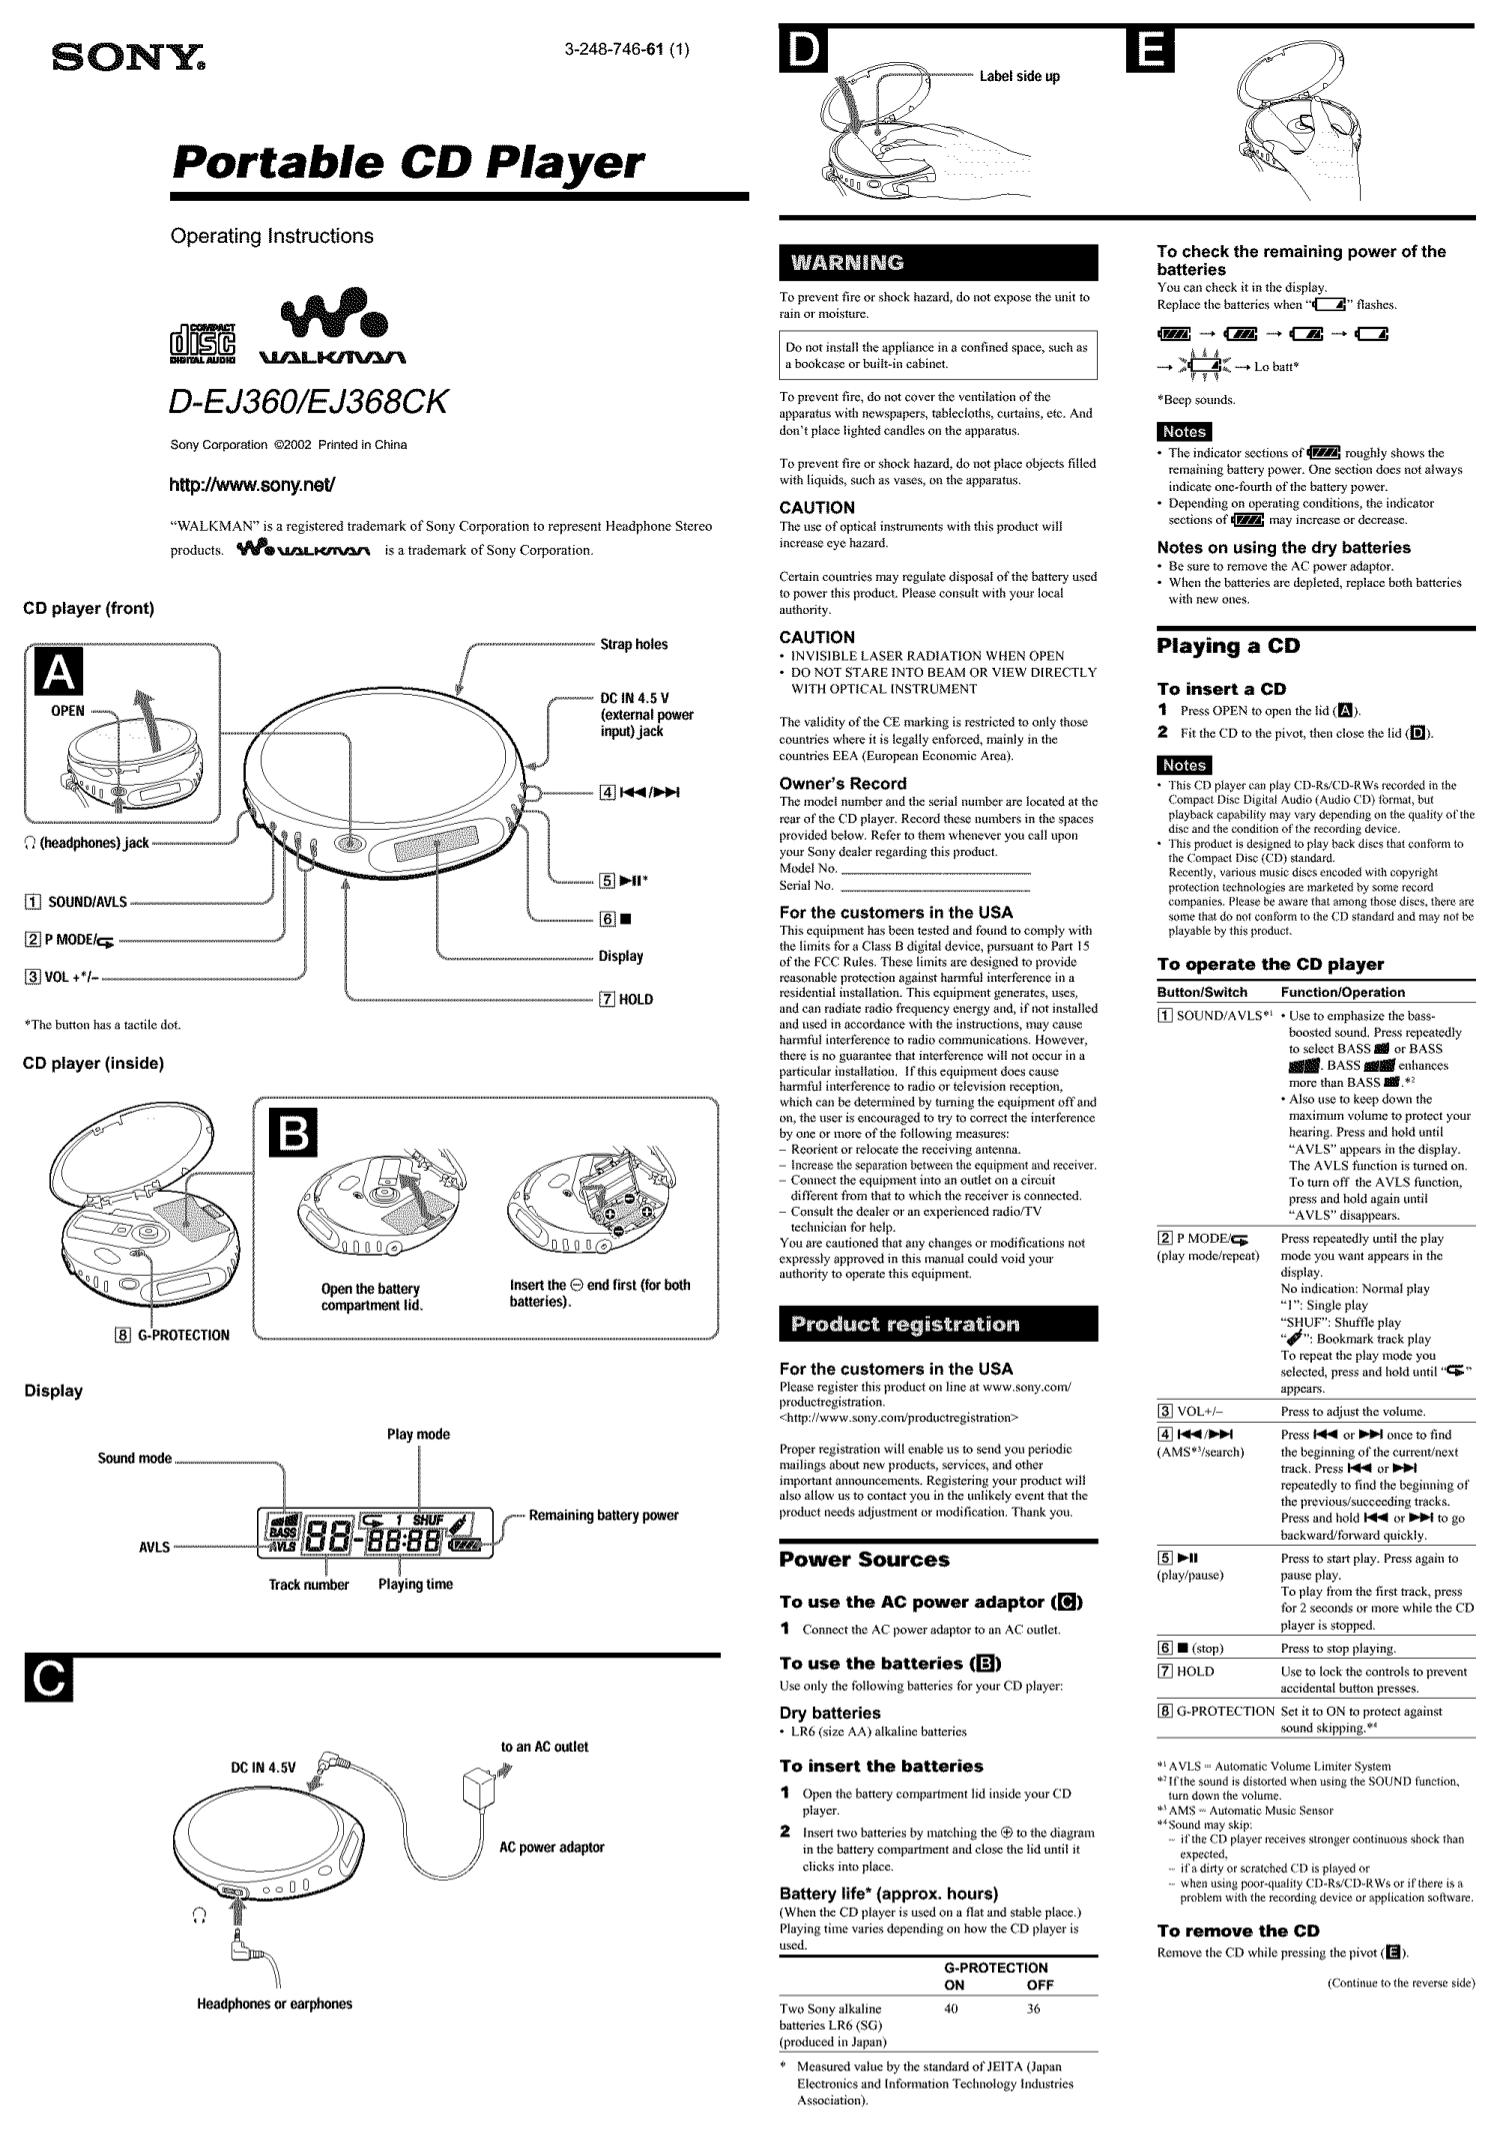 Download free pdf for Sony Walkman D-EJ368CK CD Player manual